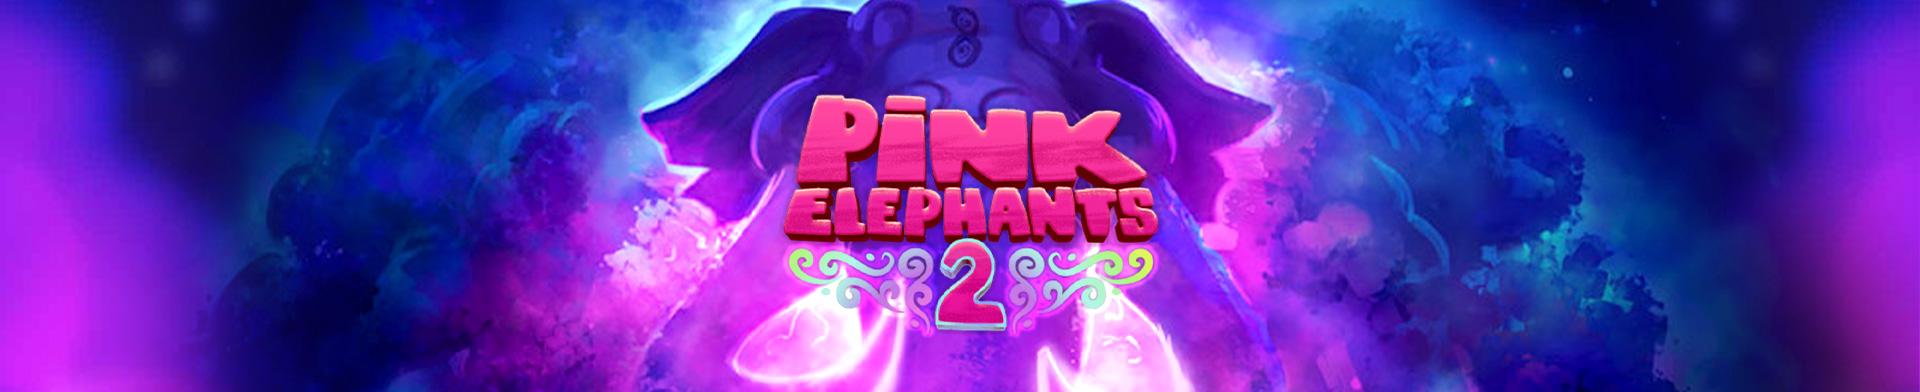 Pink Elephants 2 banner